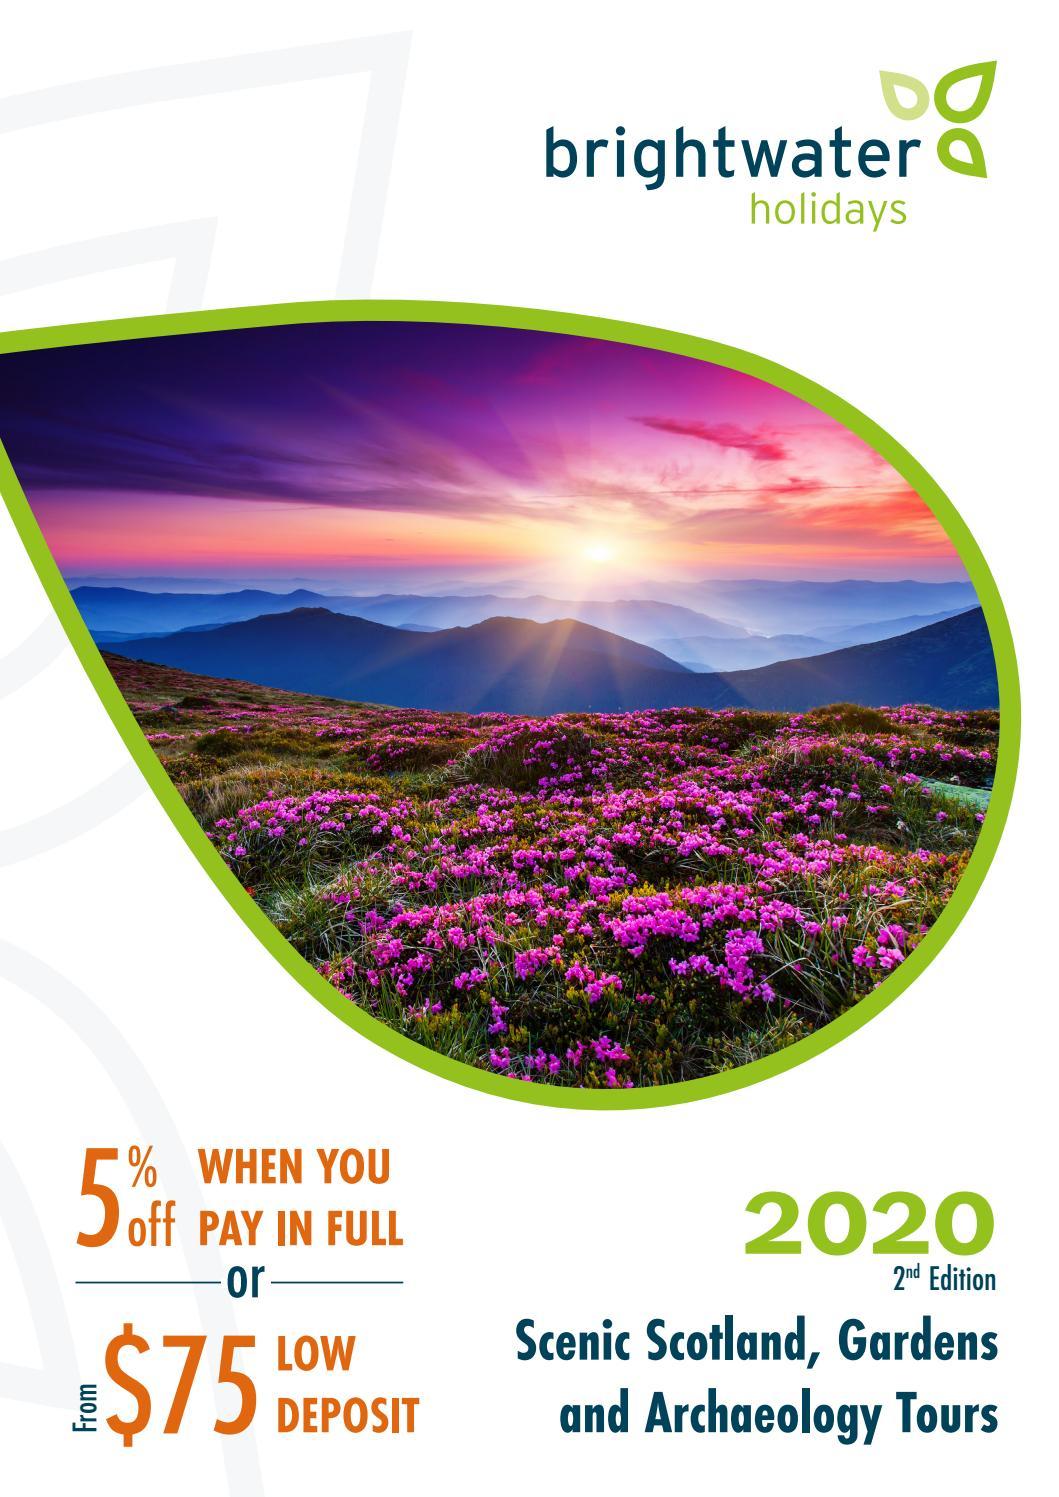 Transformation Grange En Habitation Rt 2012 brightwater holidays 2020 2nd edition – control us edition